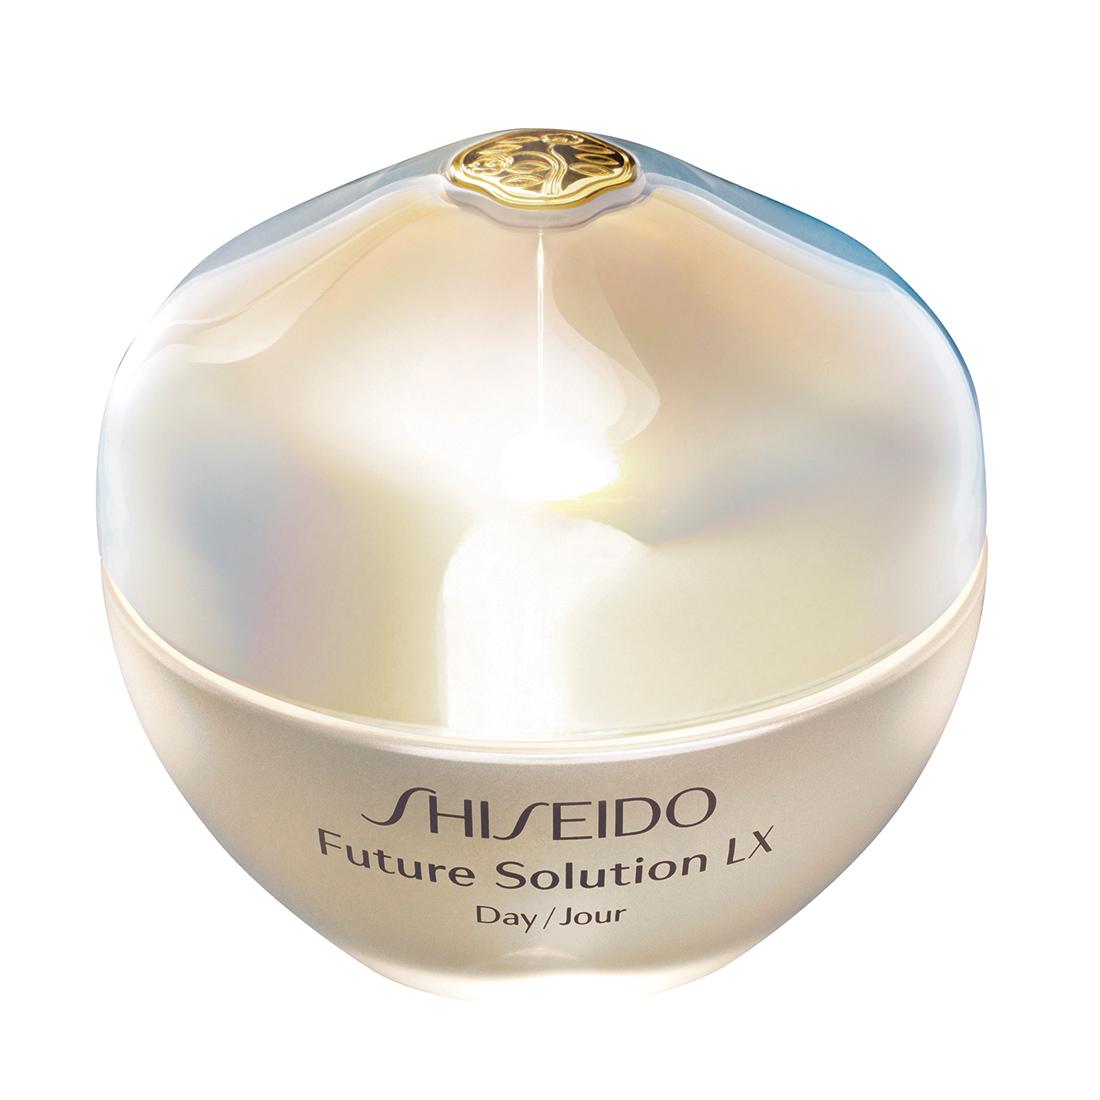 Shiseido - Future Solution Lx - Crème Protectrice Totale SPF15 50 ml